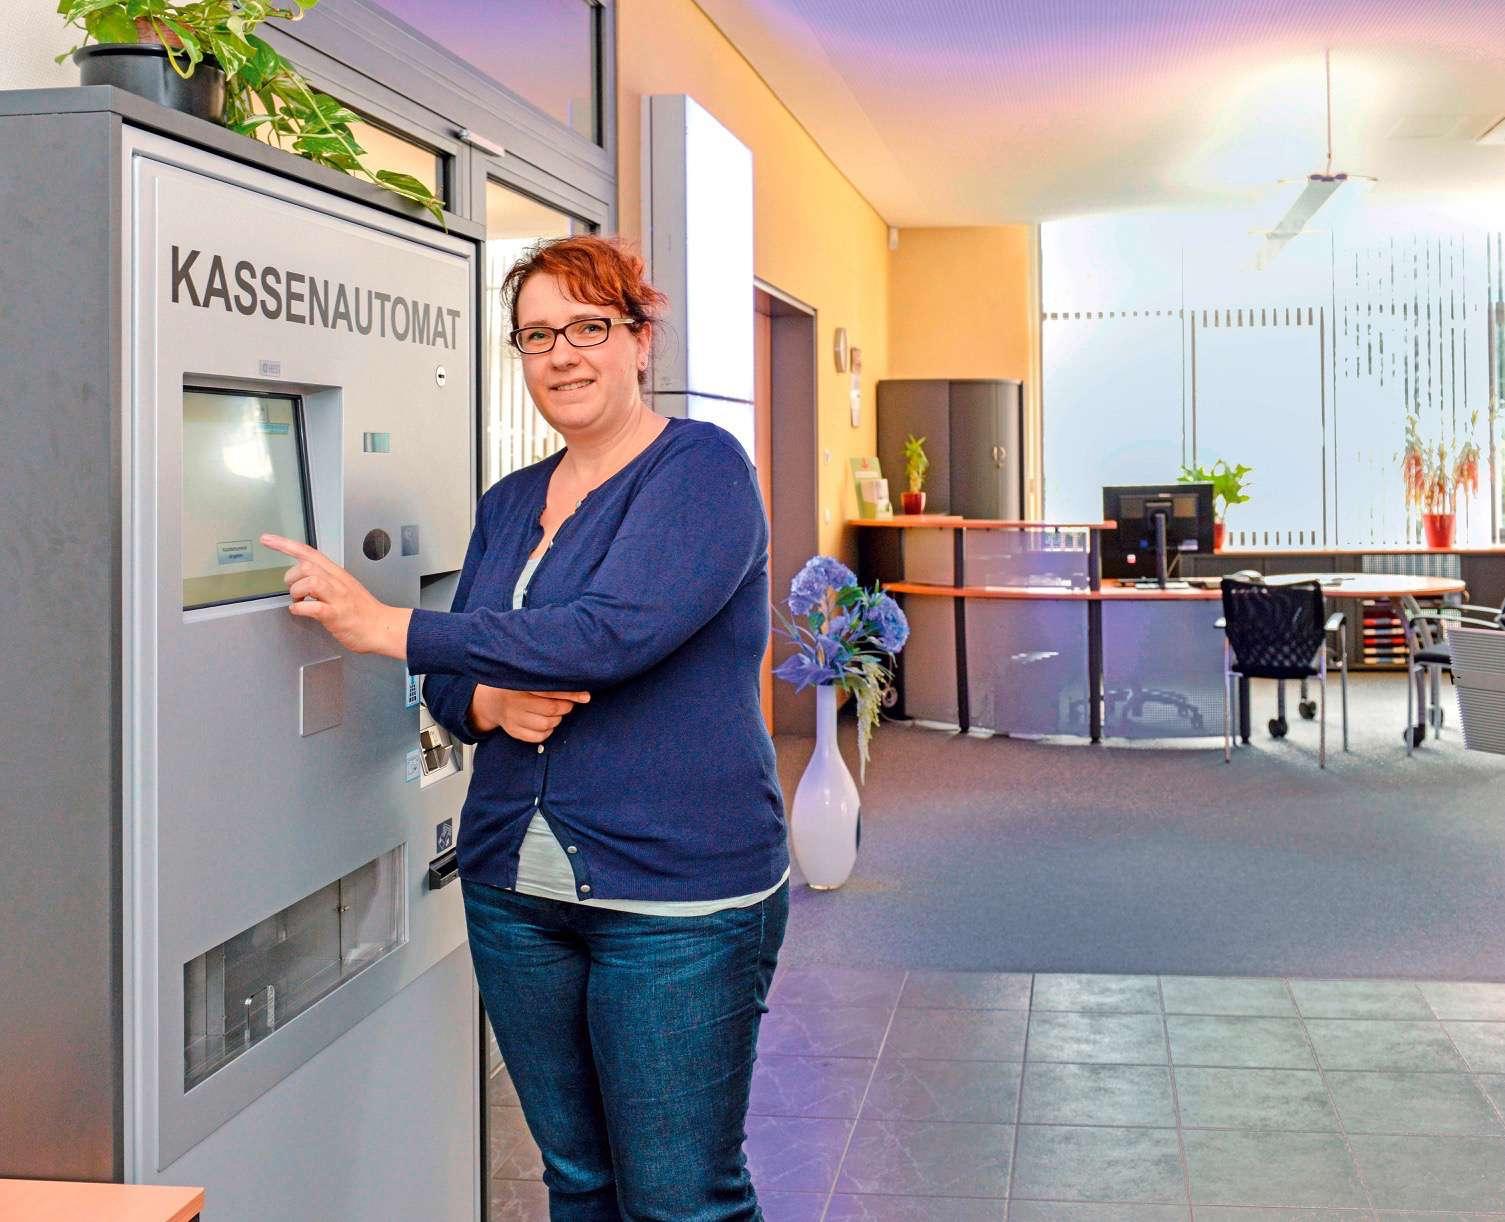 14.07.2015 Bernau. Kassenautomat im Kundencentrum, Marina Petzel, Stadtwerke Bernau, Bernau, Info Bernau, Bernau LIVE, Barnim, Ladeburg,